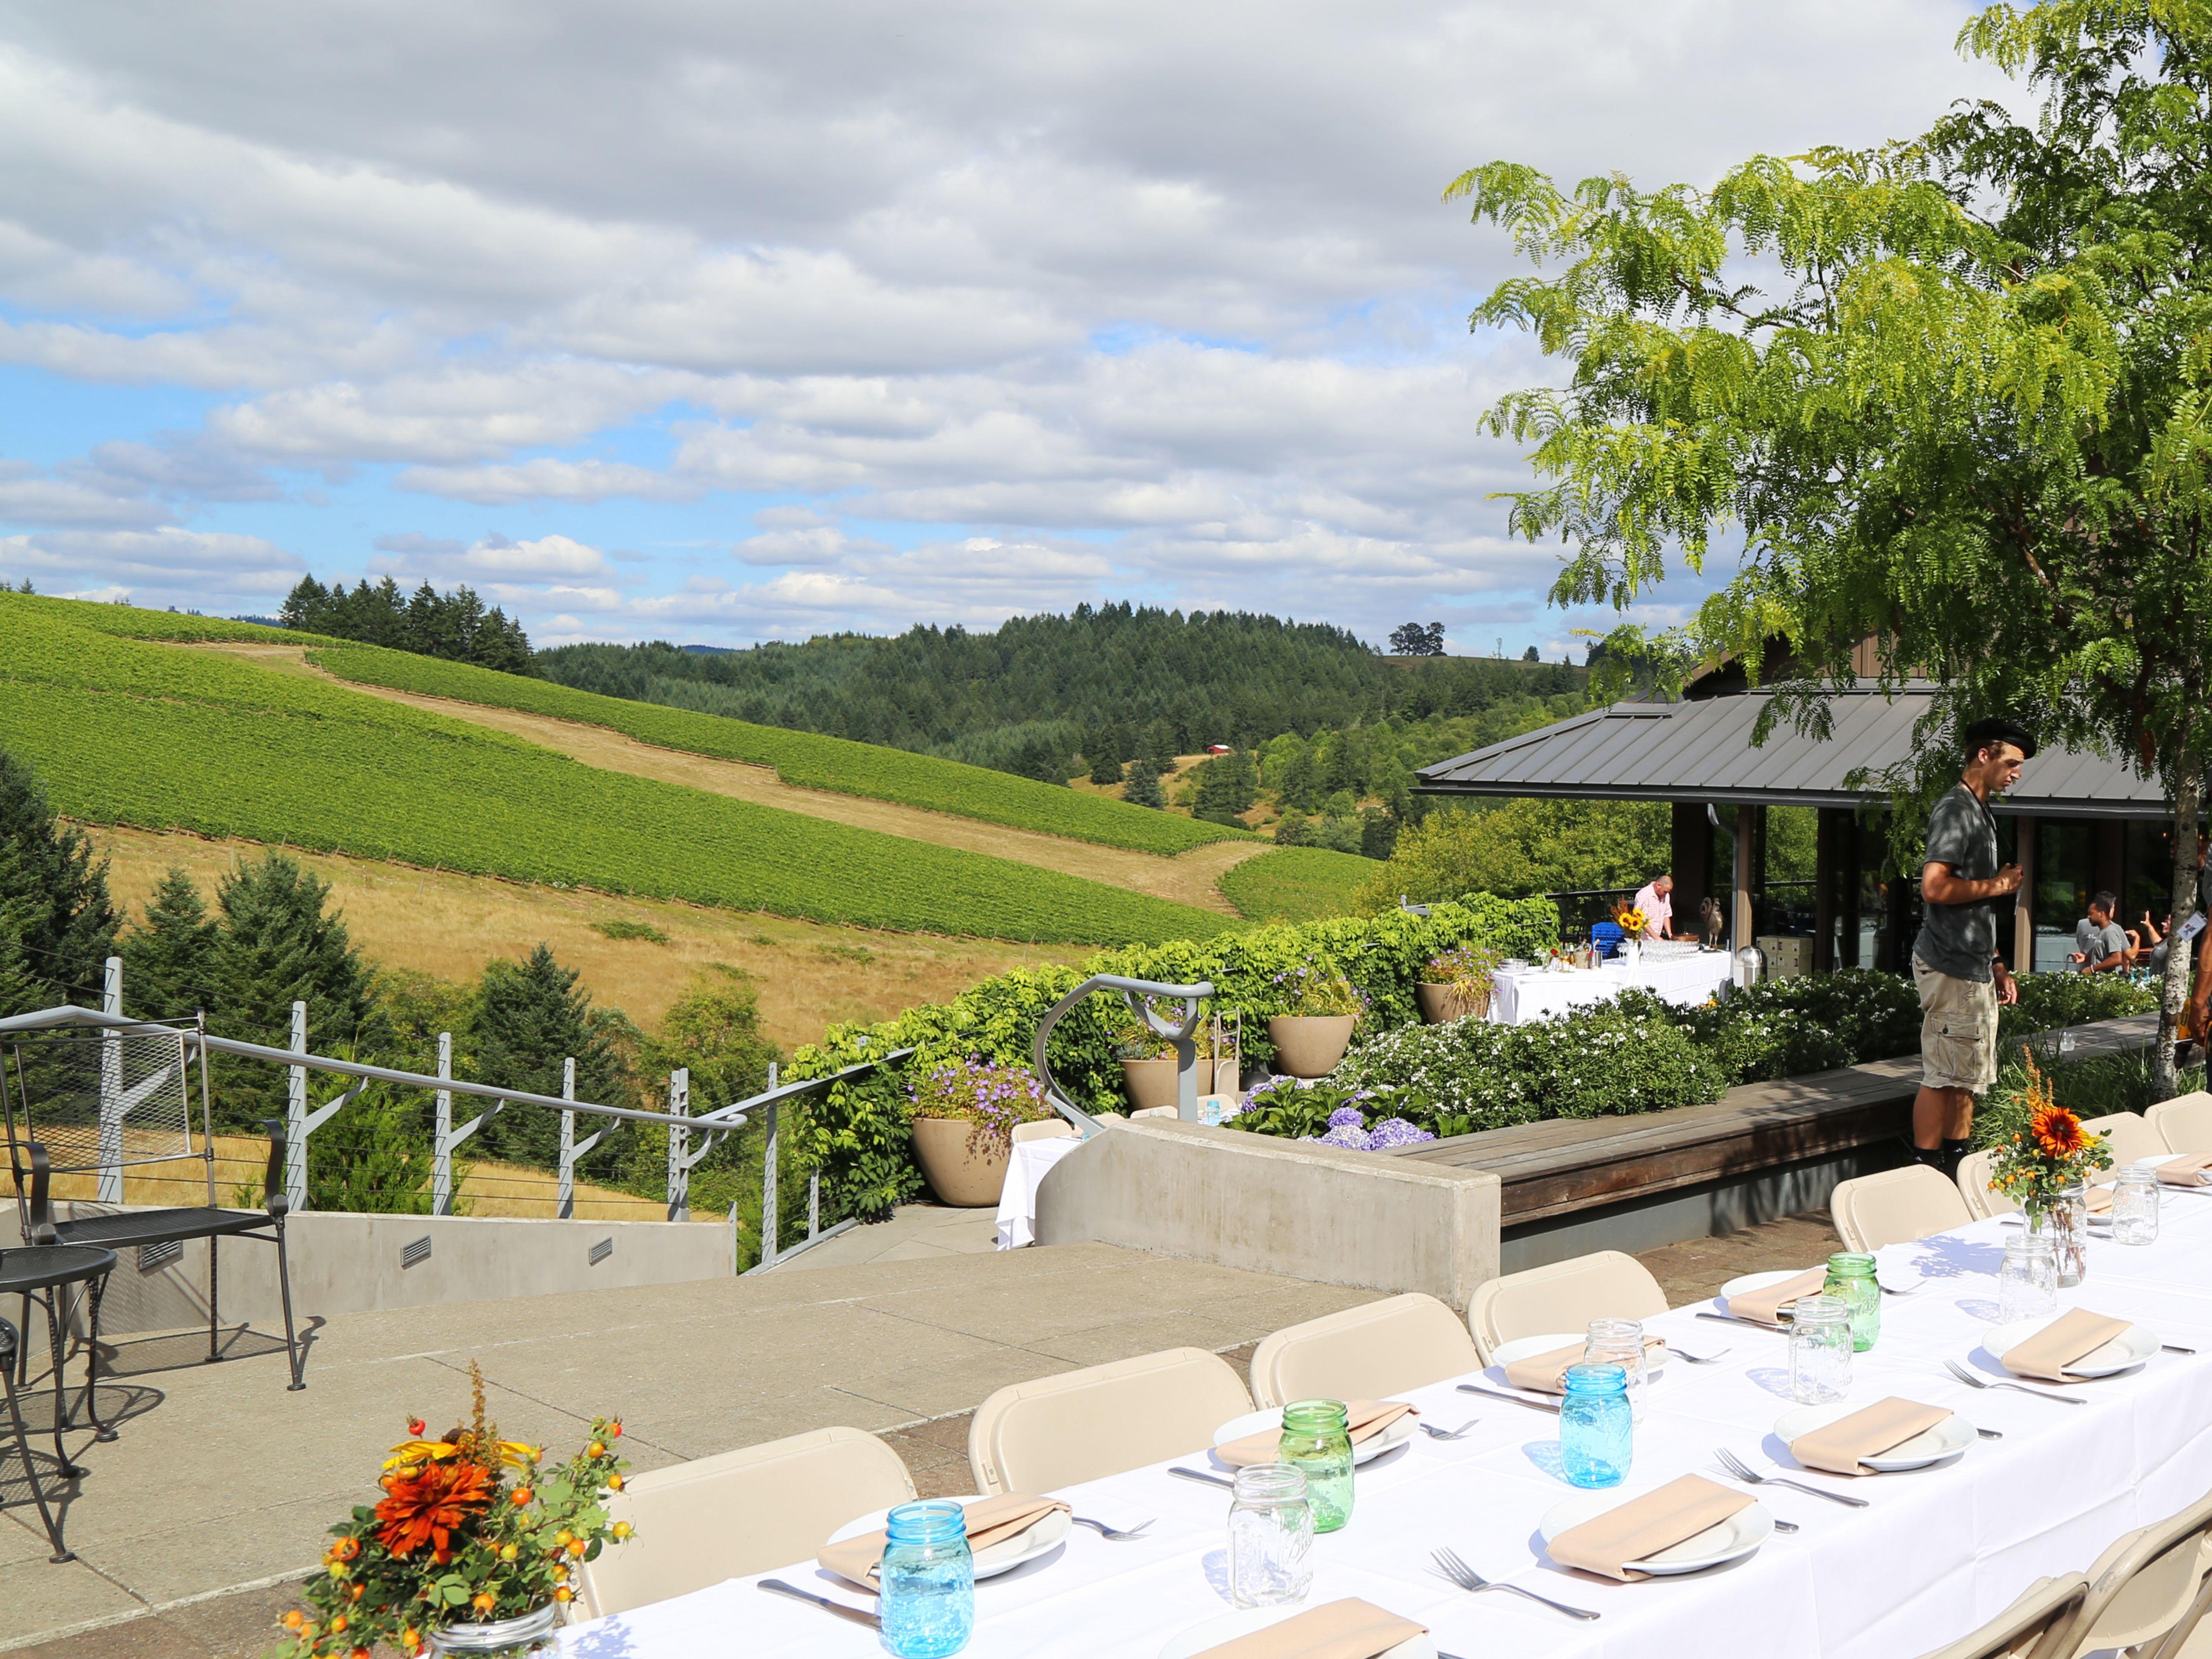 Field vine willakenzie edw04v